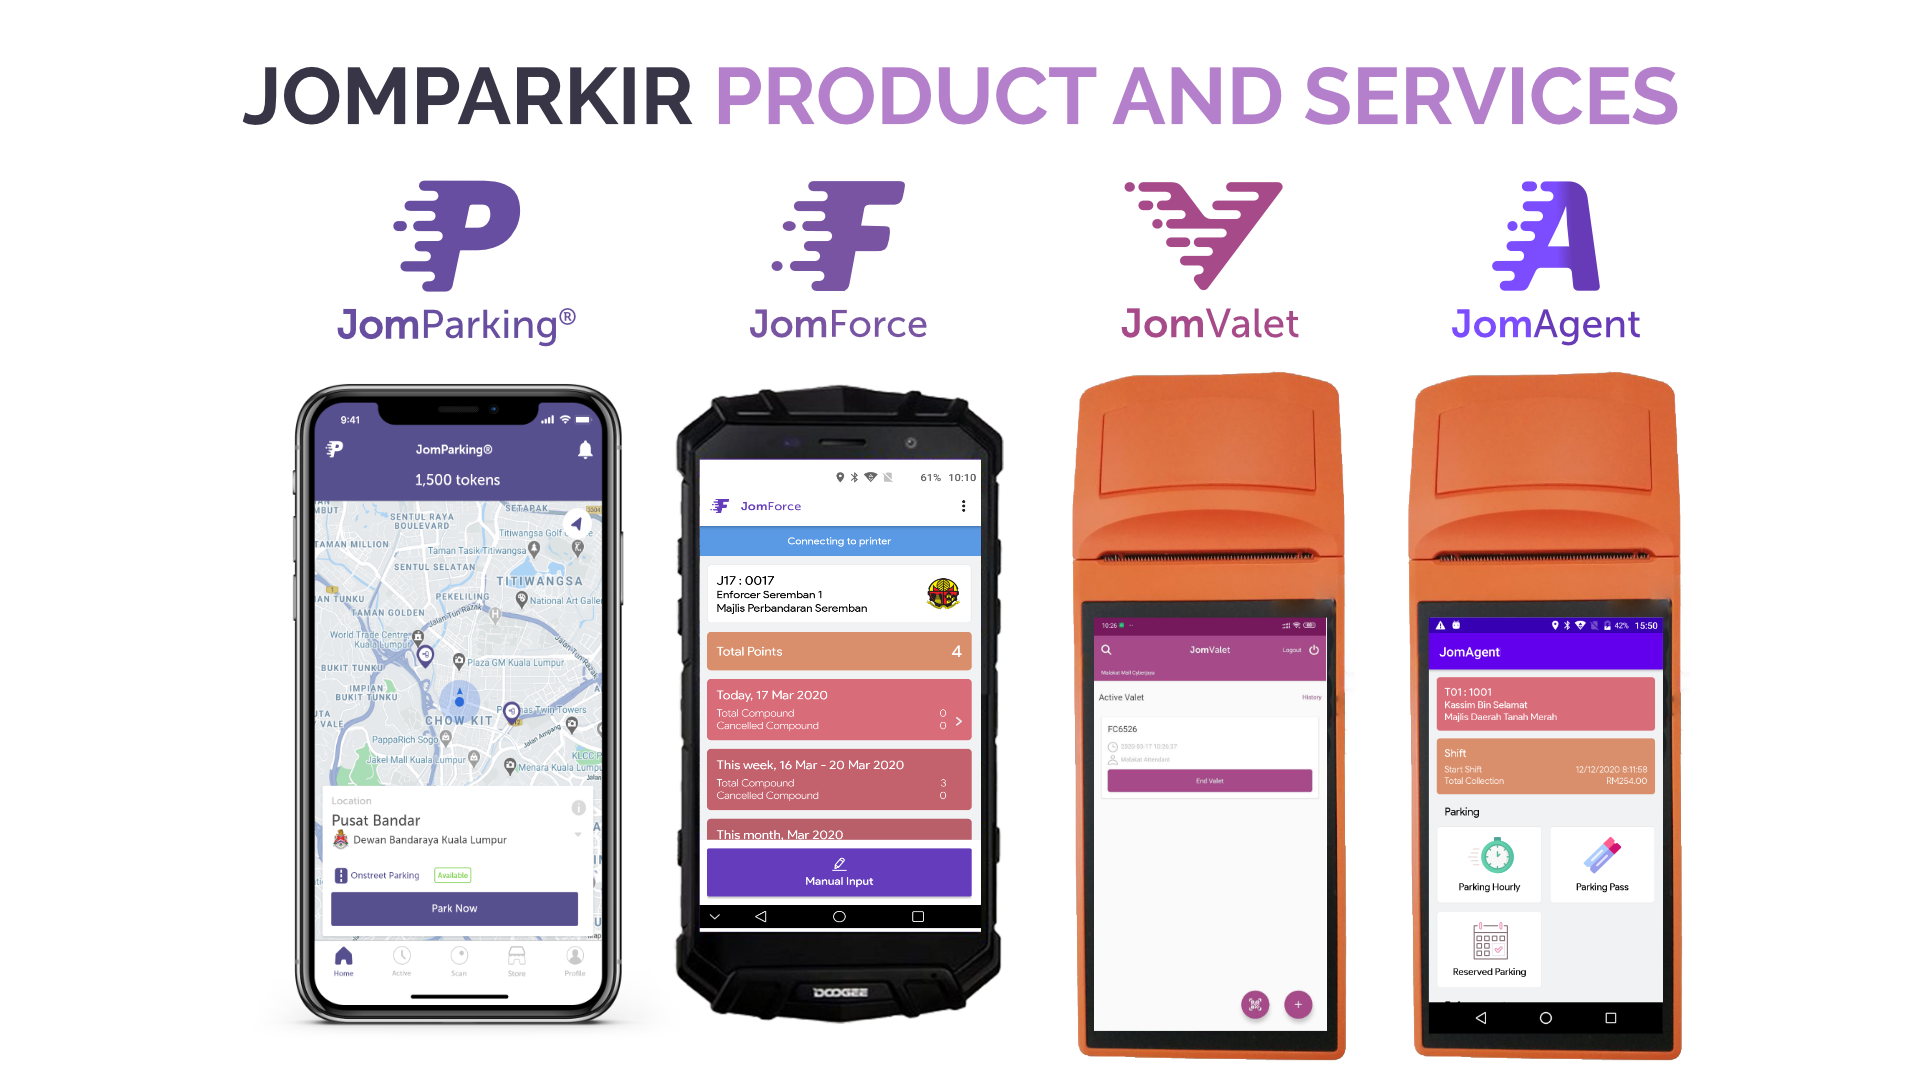 JomParkir Product